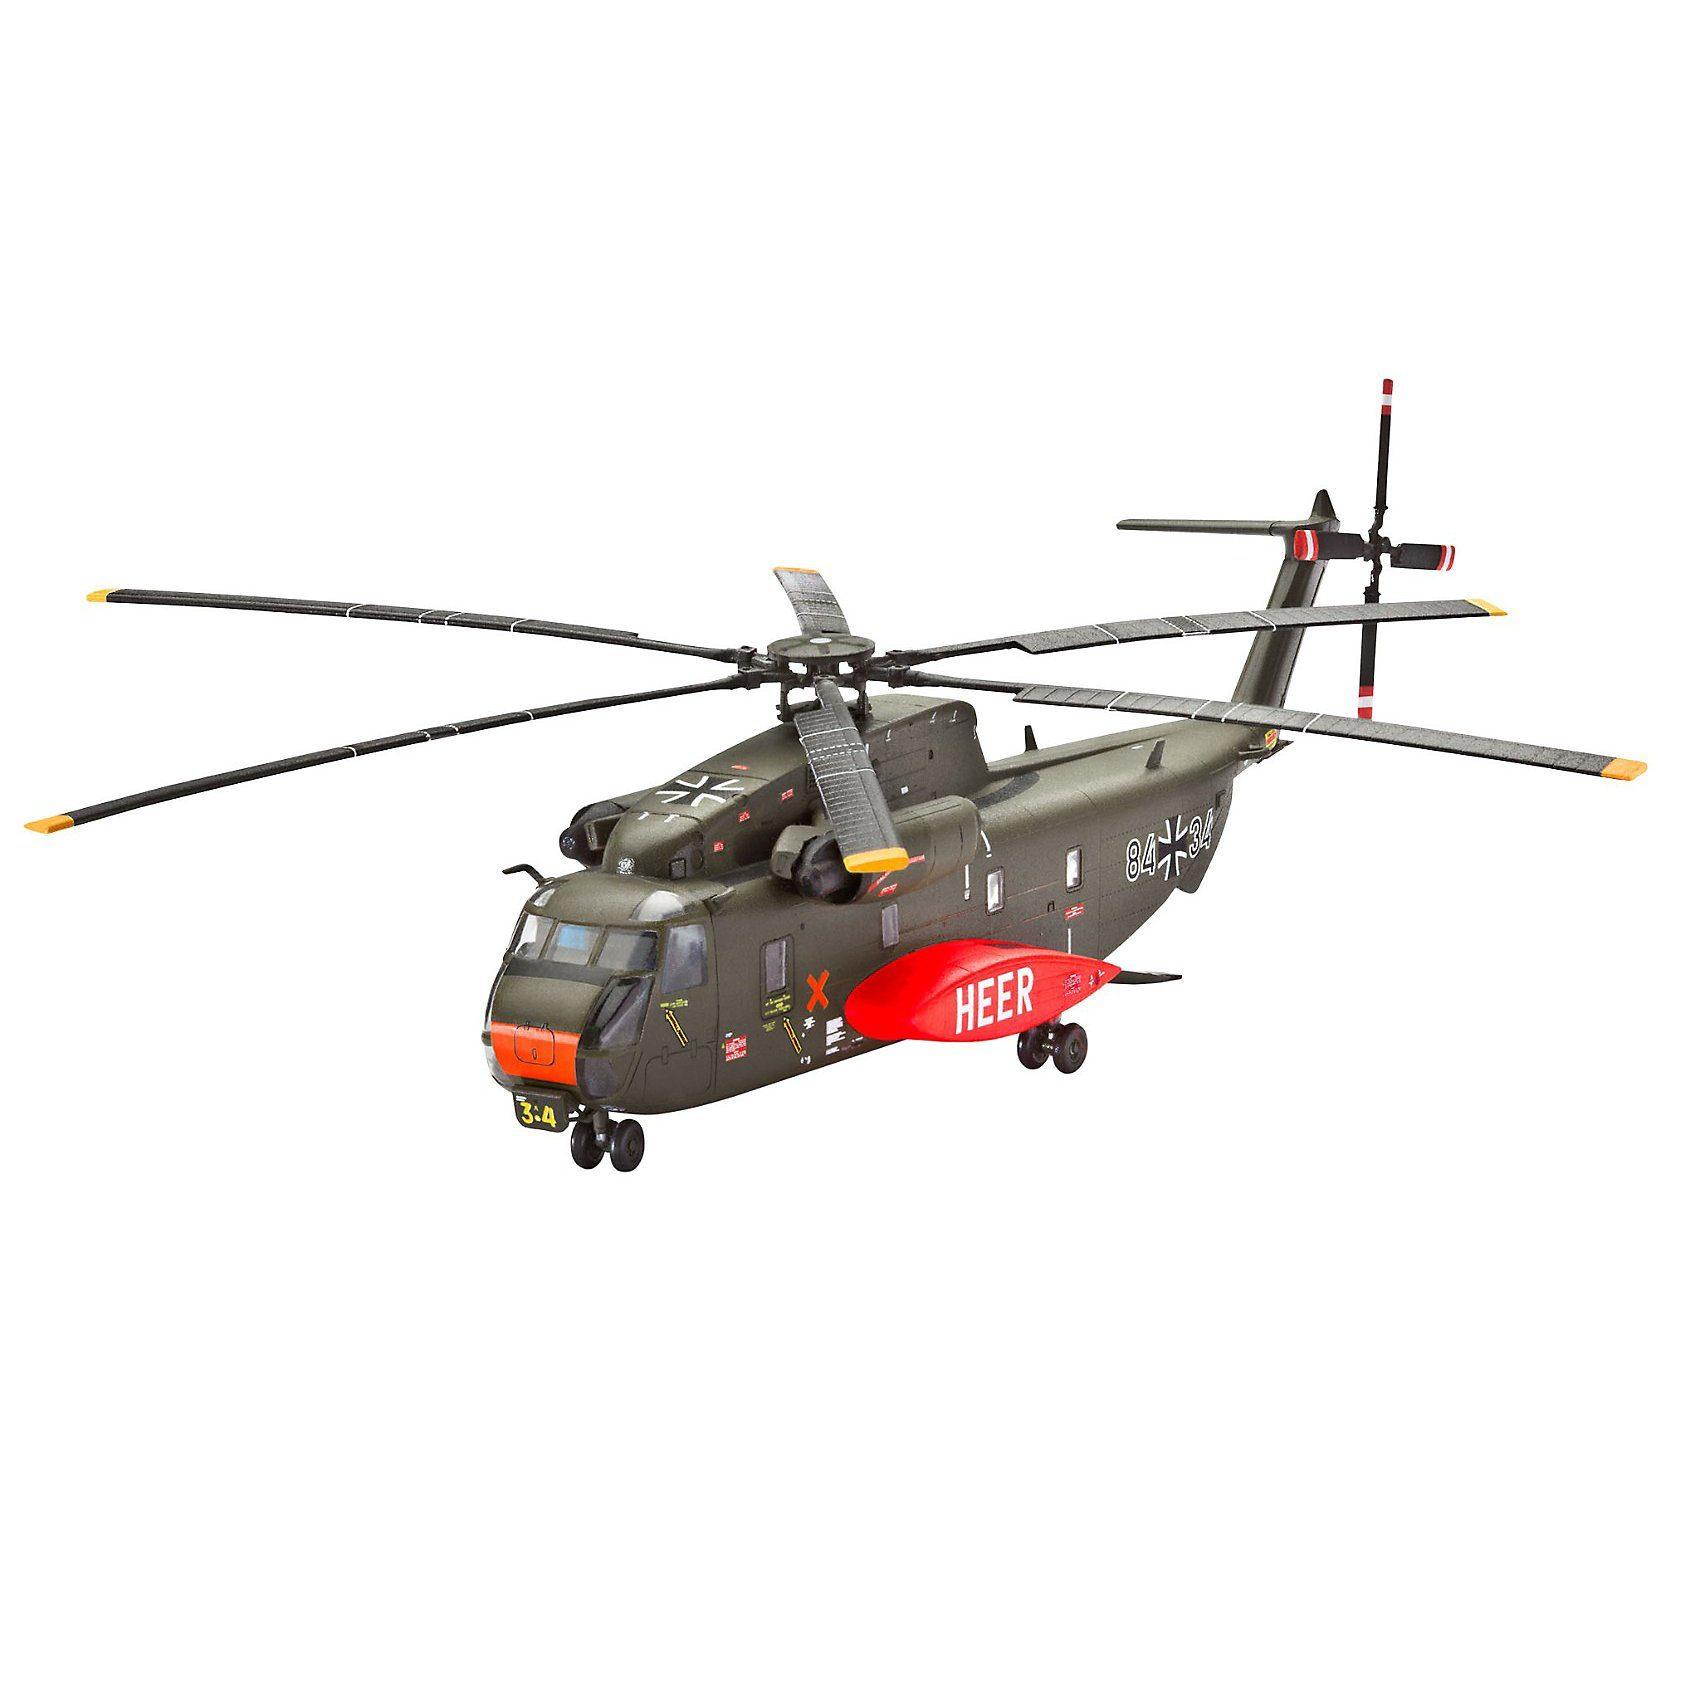 Revell Modellbausatz CH-53G Heavy Transport im Maßstab 1:144